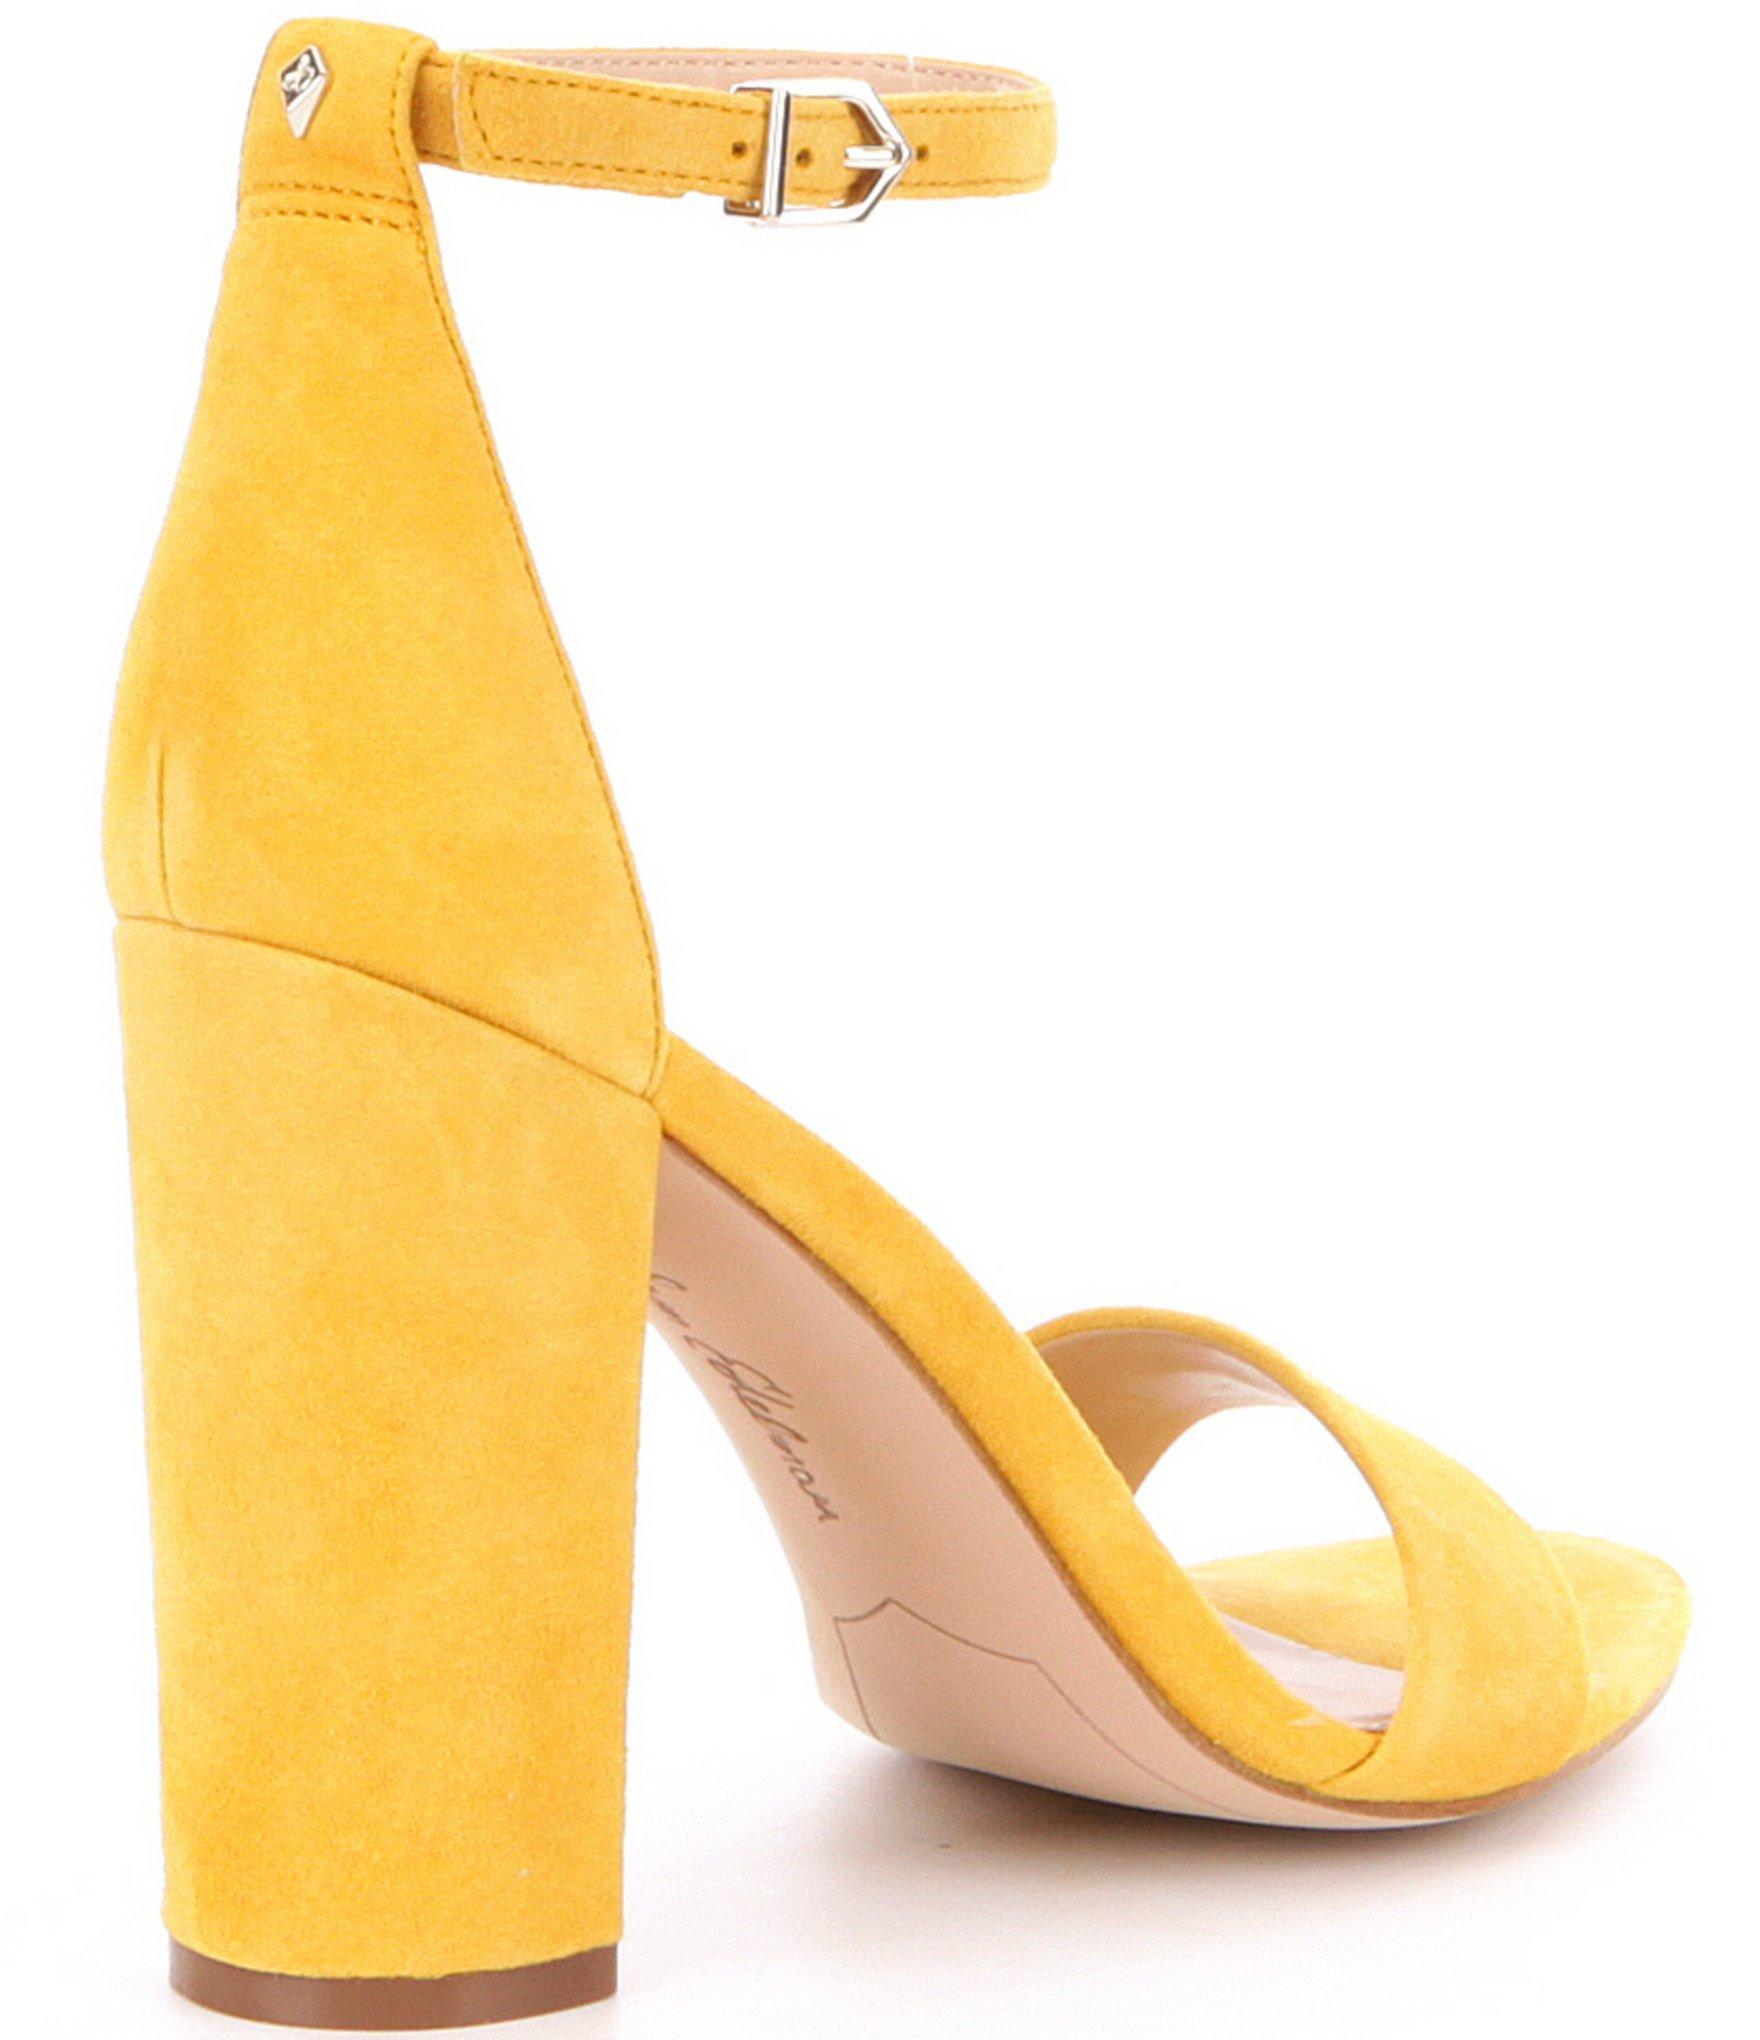 9657693603fb Lyst - Sam Edelman Yaro Suede Block Heel Dress Sandals in Yellow